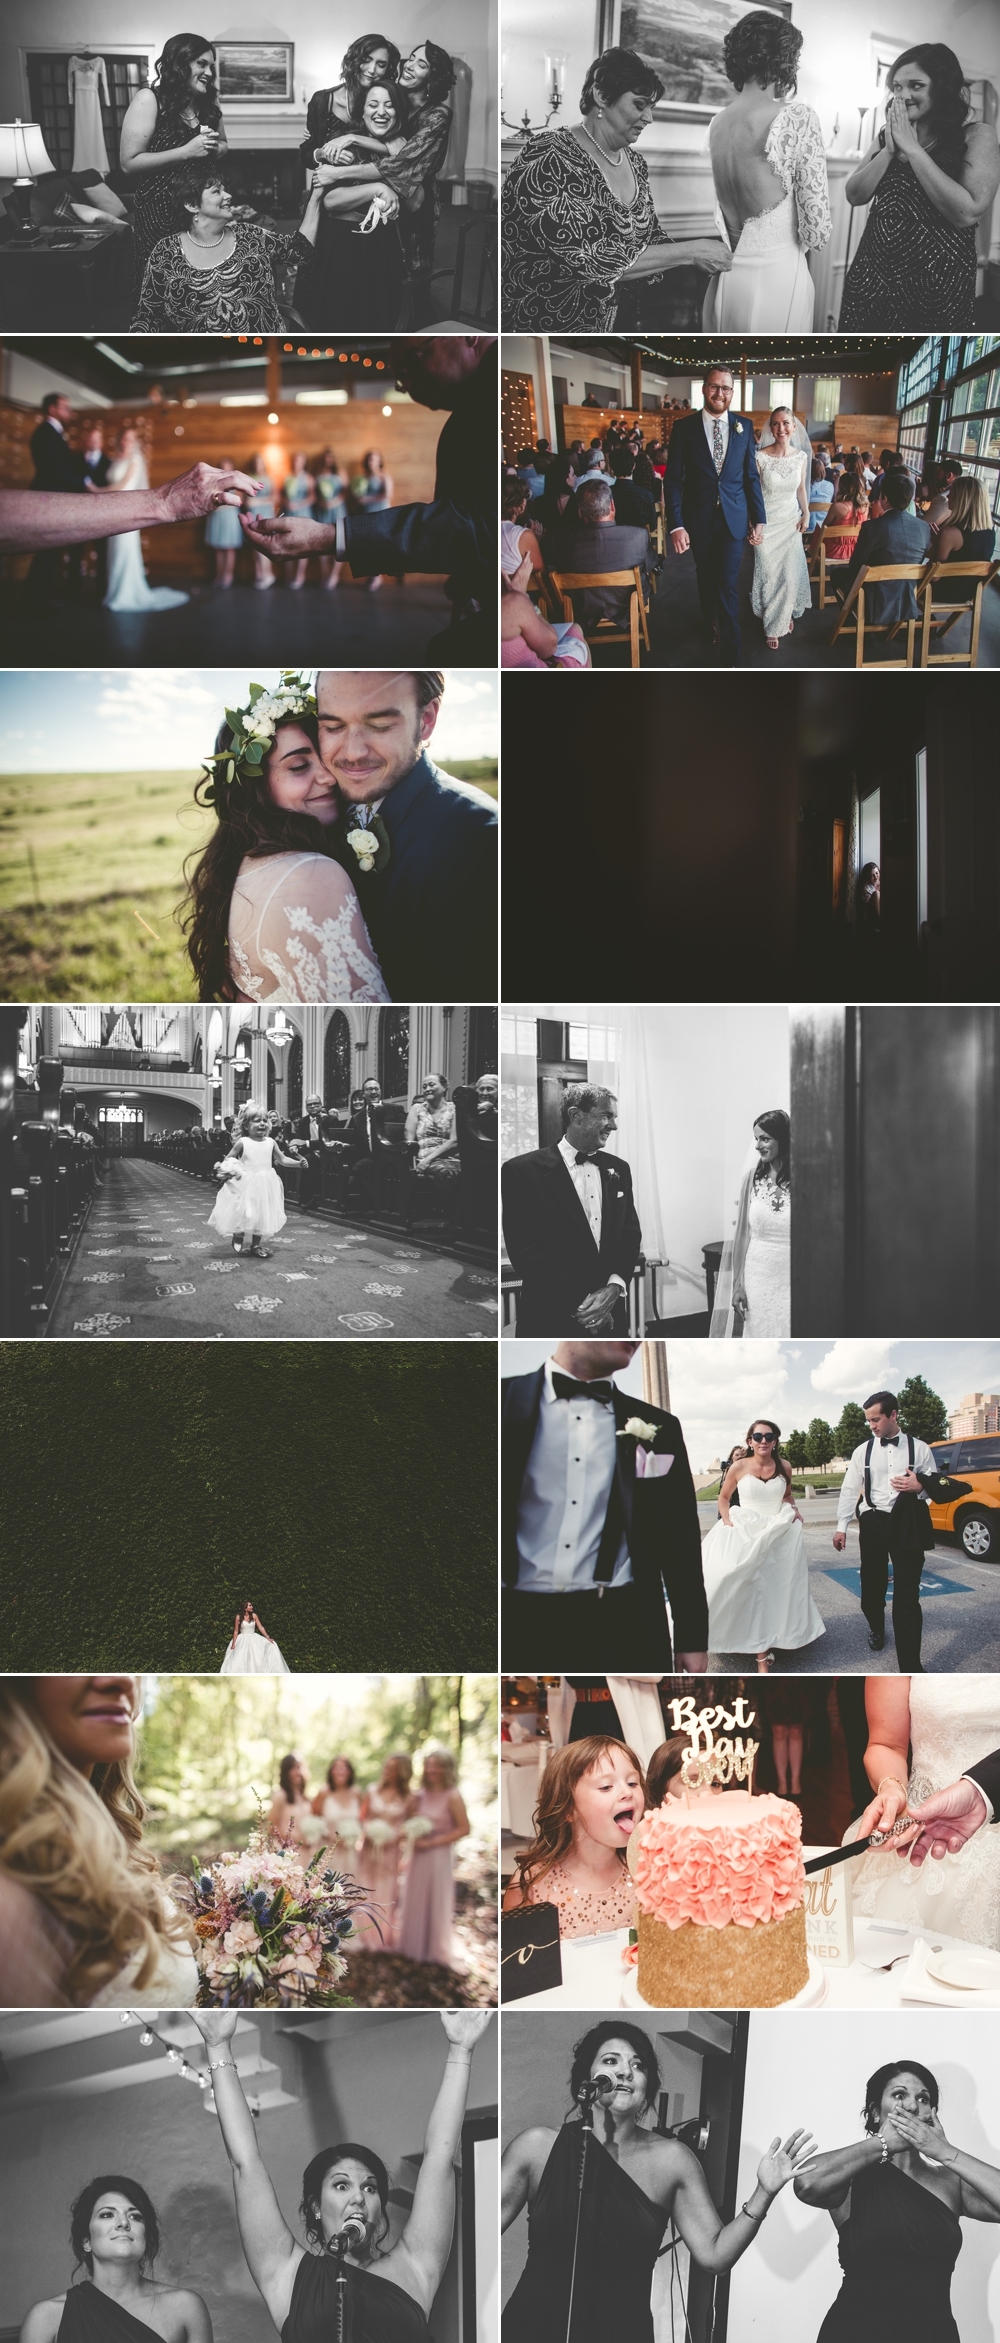 jason_domingues_photography_best_kansas_city_photography_kc_wedding_weddings0001.jpg